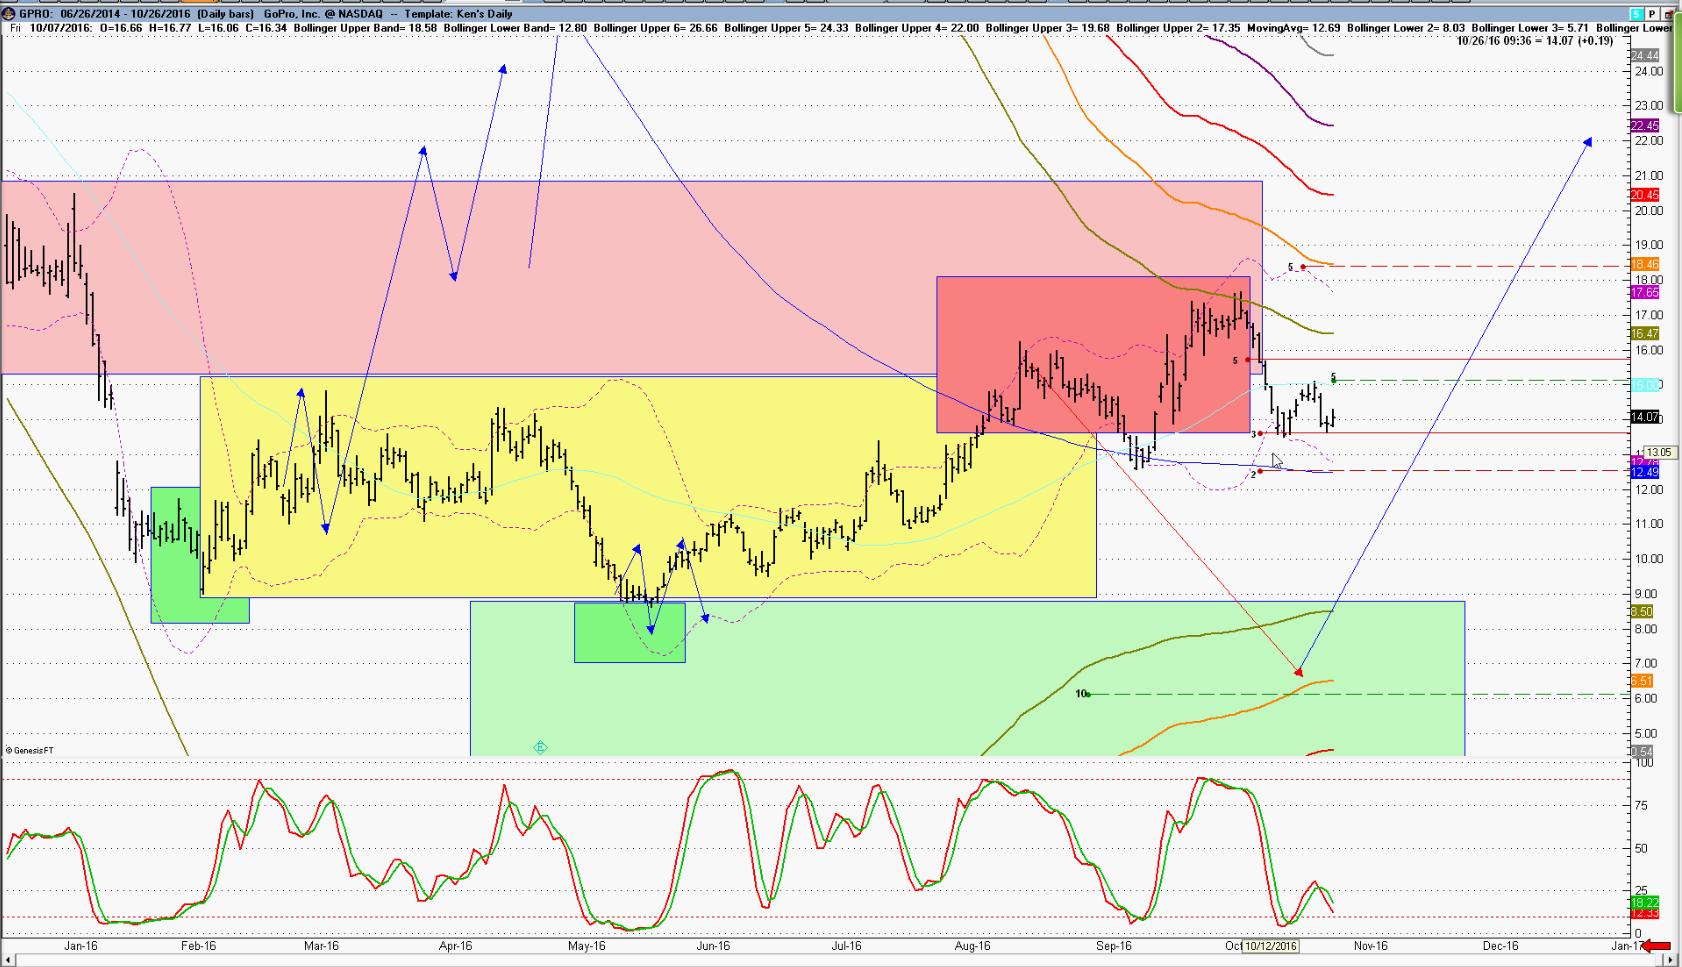 Gopro options trading